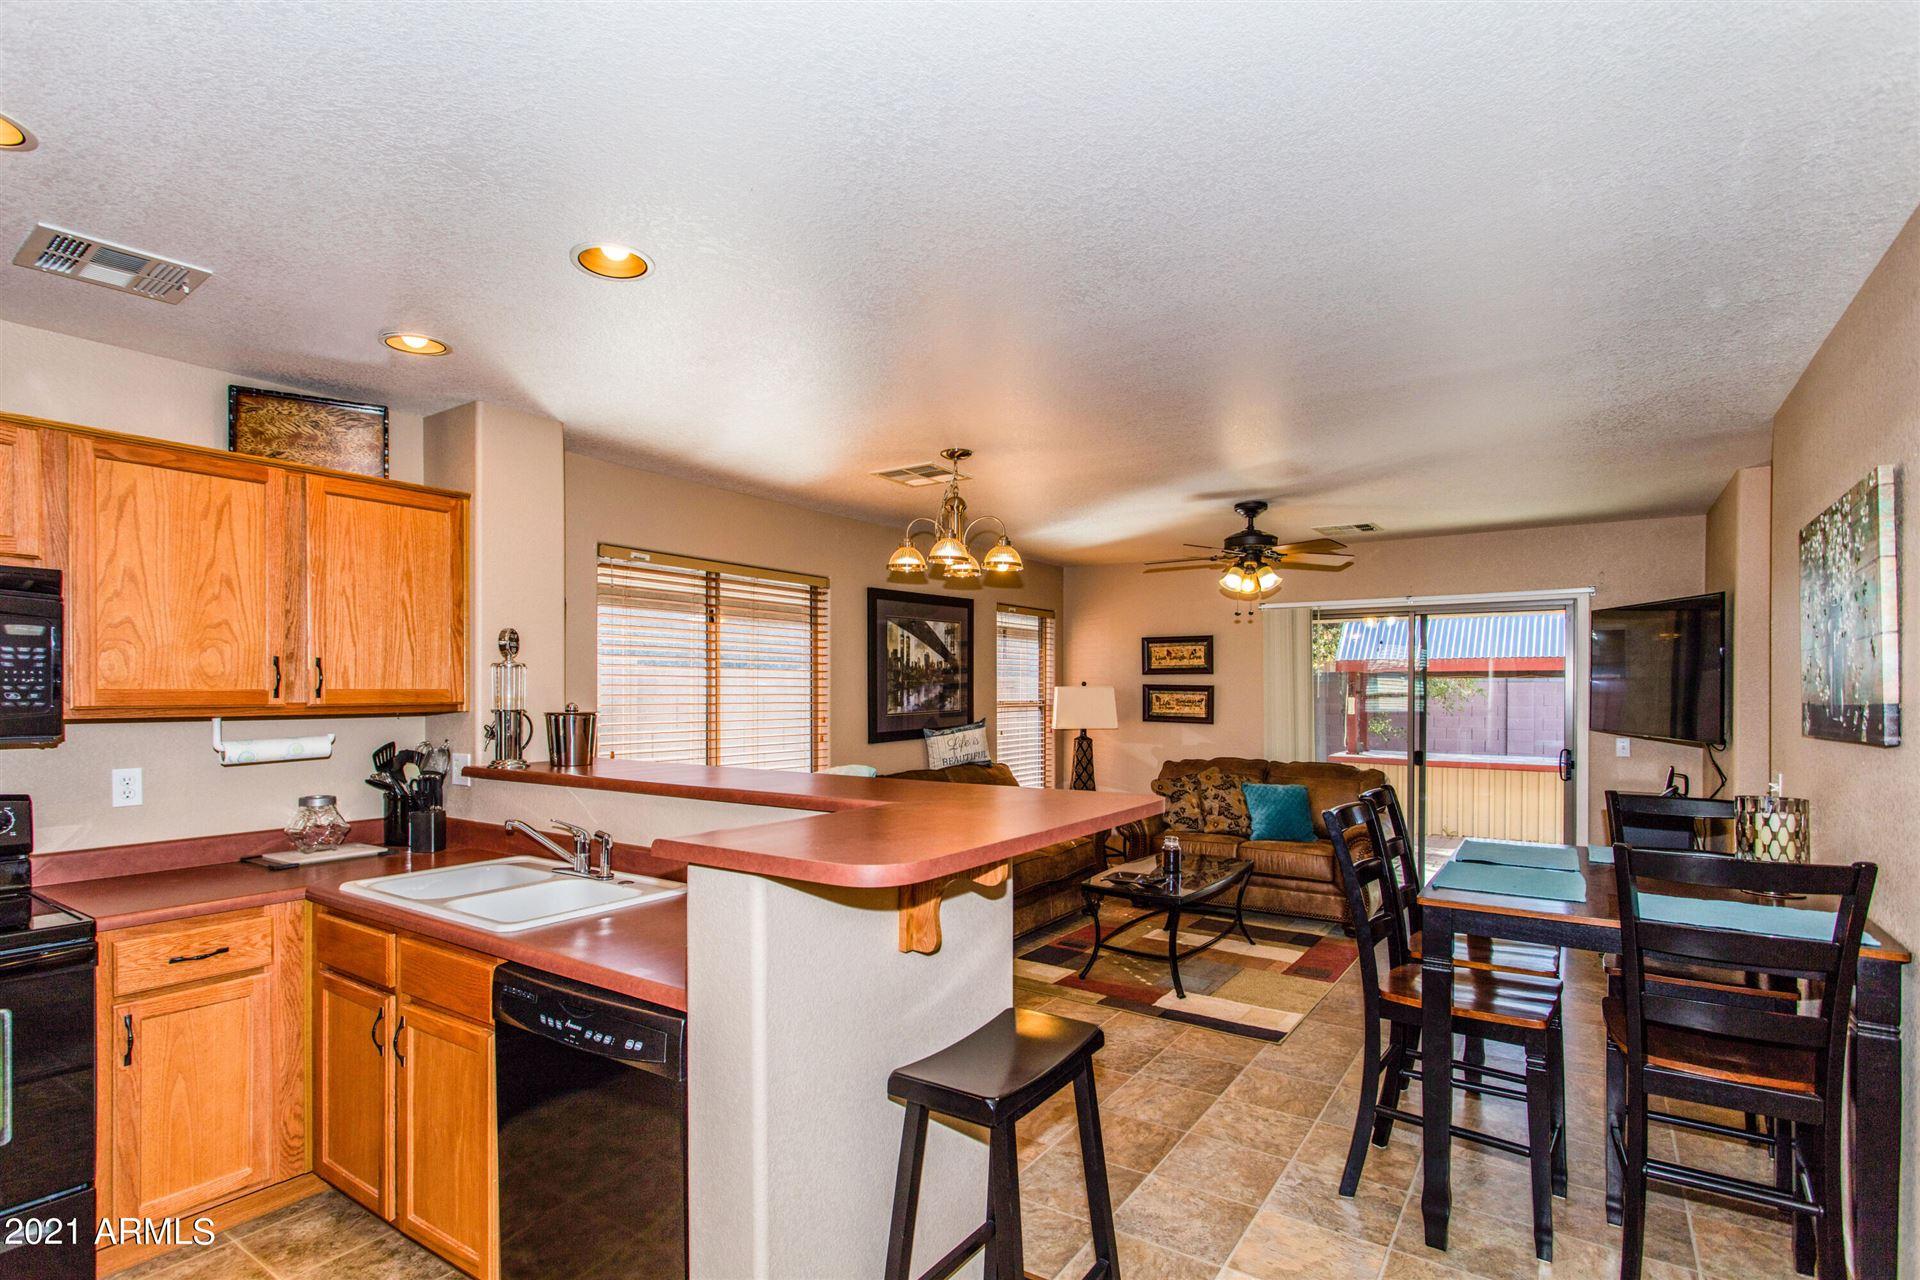 Photo of 36571 W MALLORCA Avenue, Maricopa, AZ 85138 (MLS # 6202385)